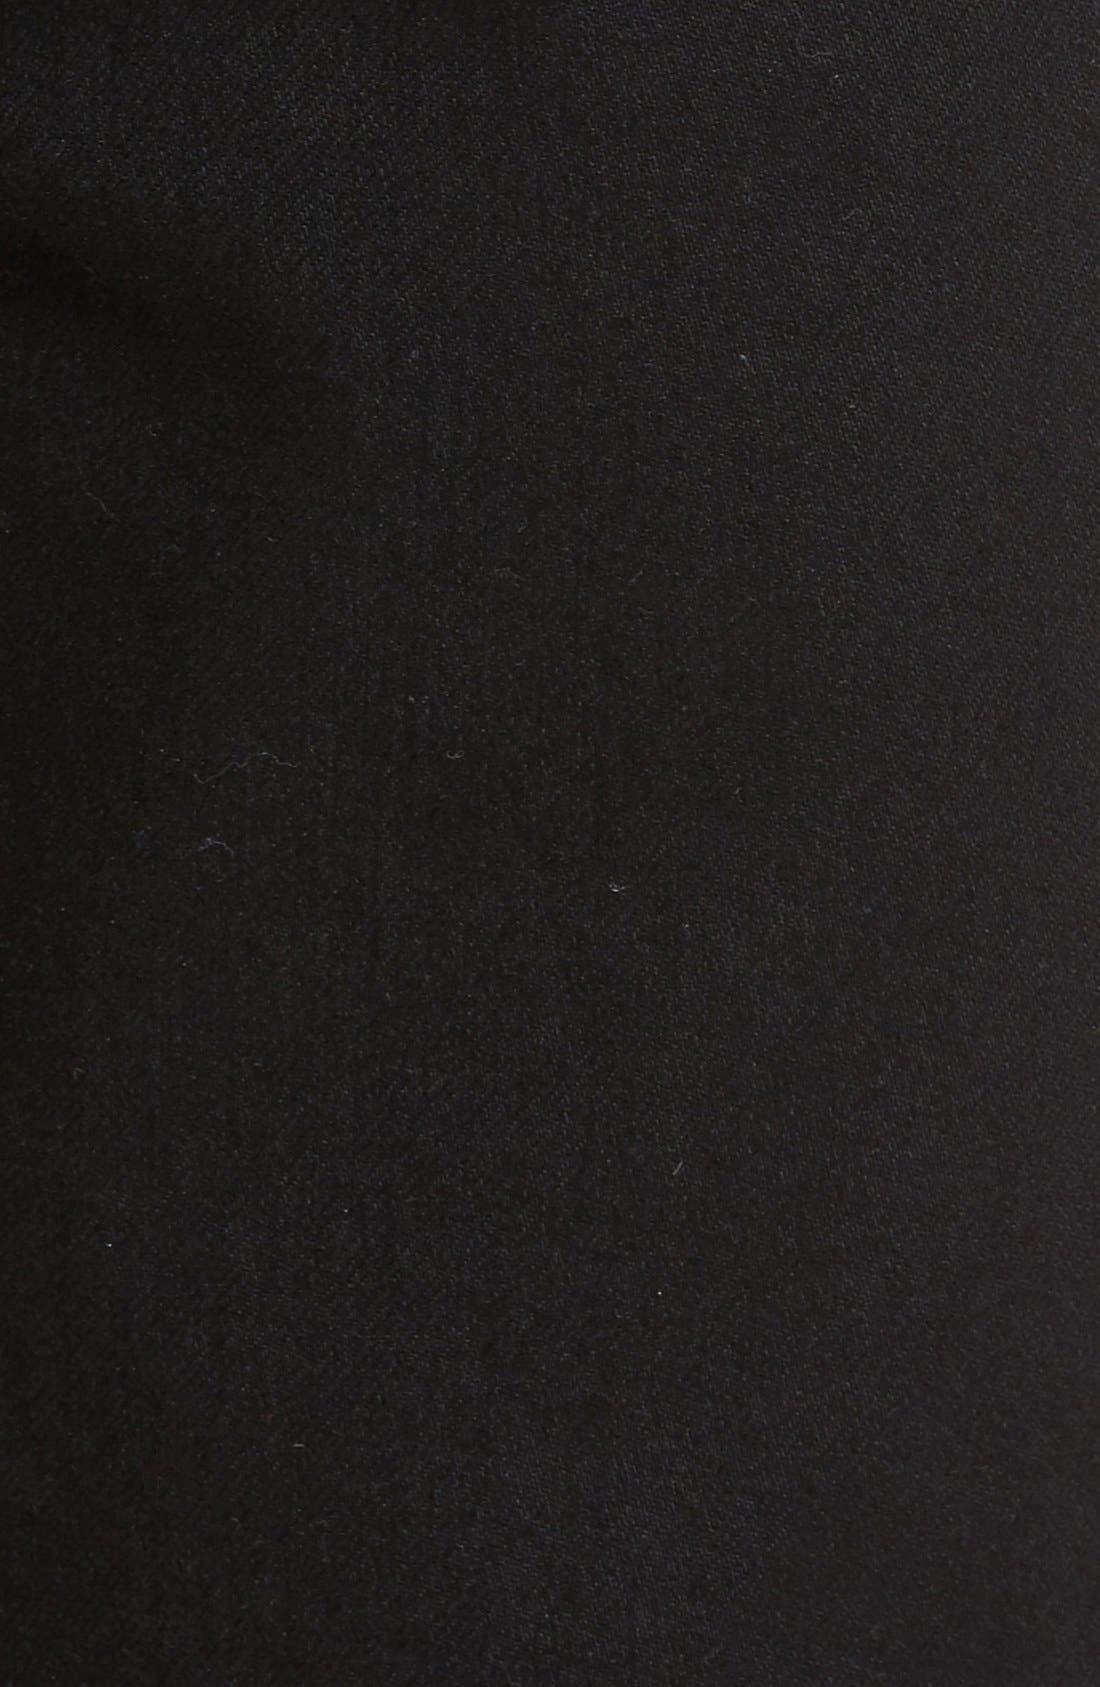 Slimmy Slim Fit Jeans,                             Alternate thumbnail 3, color,                             004